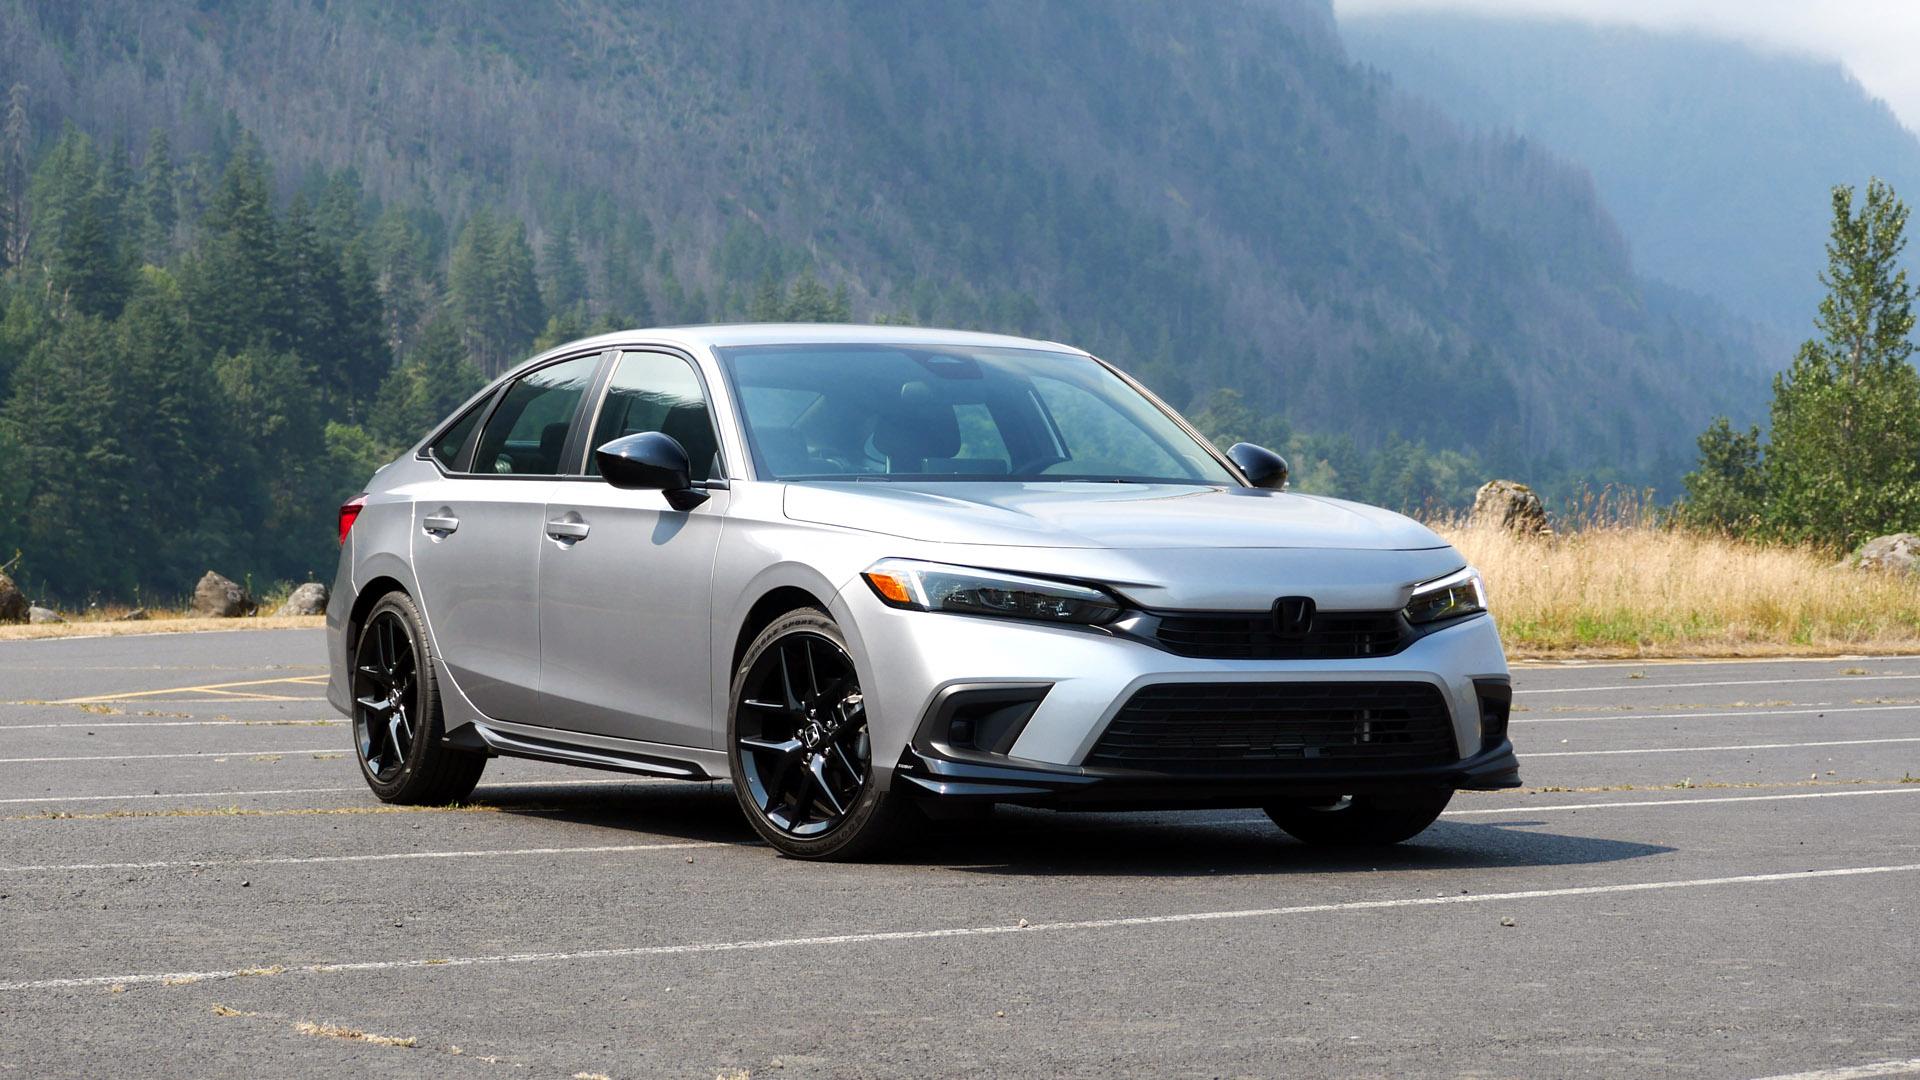 2022 Honda Civic Sport front